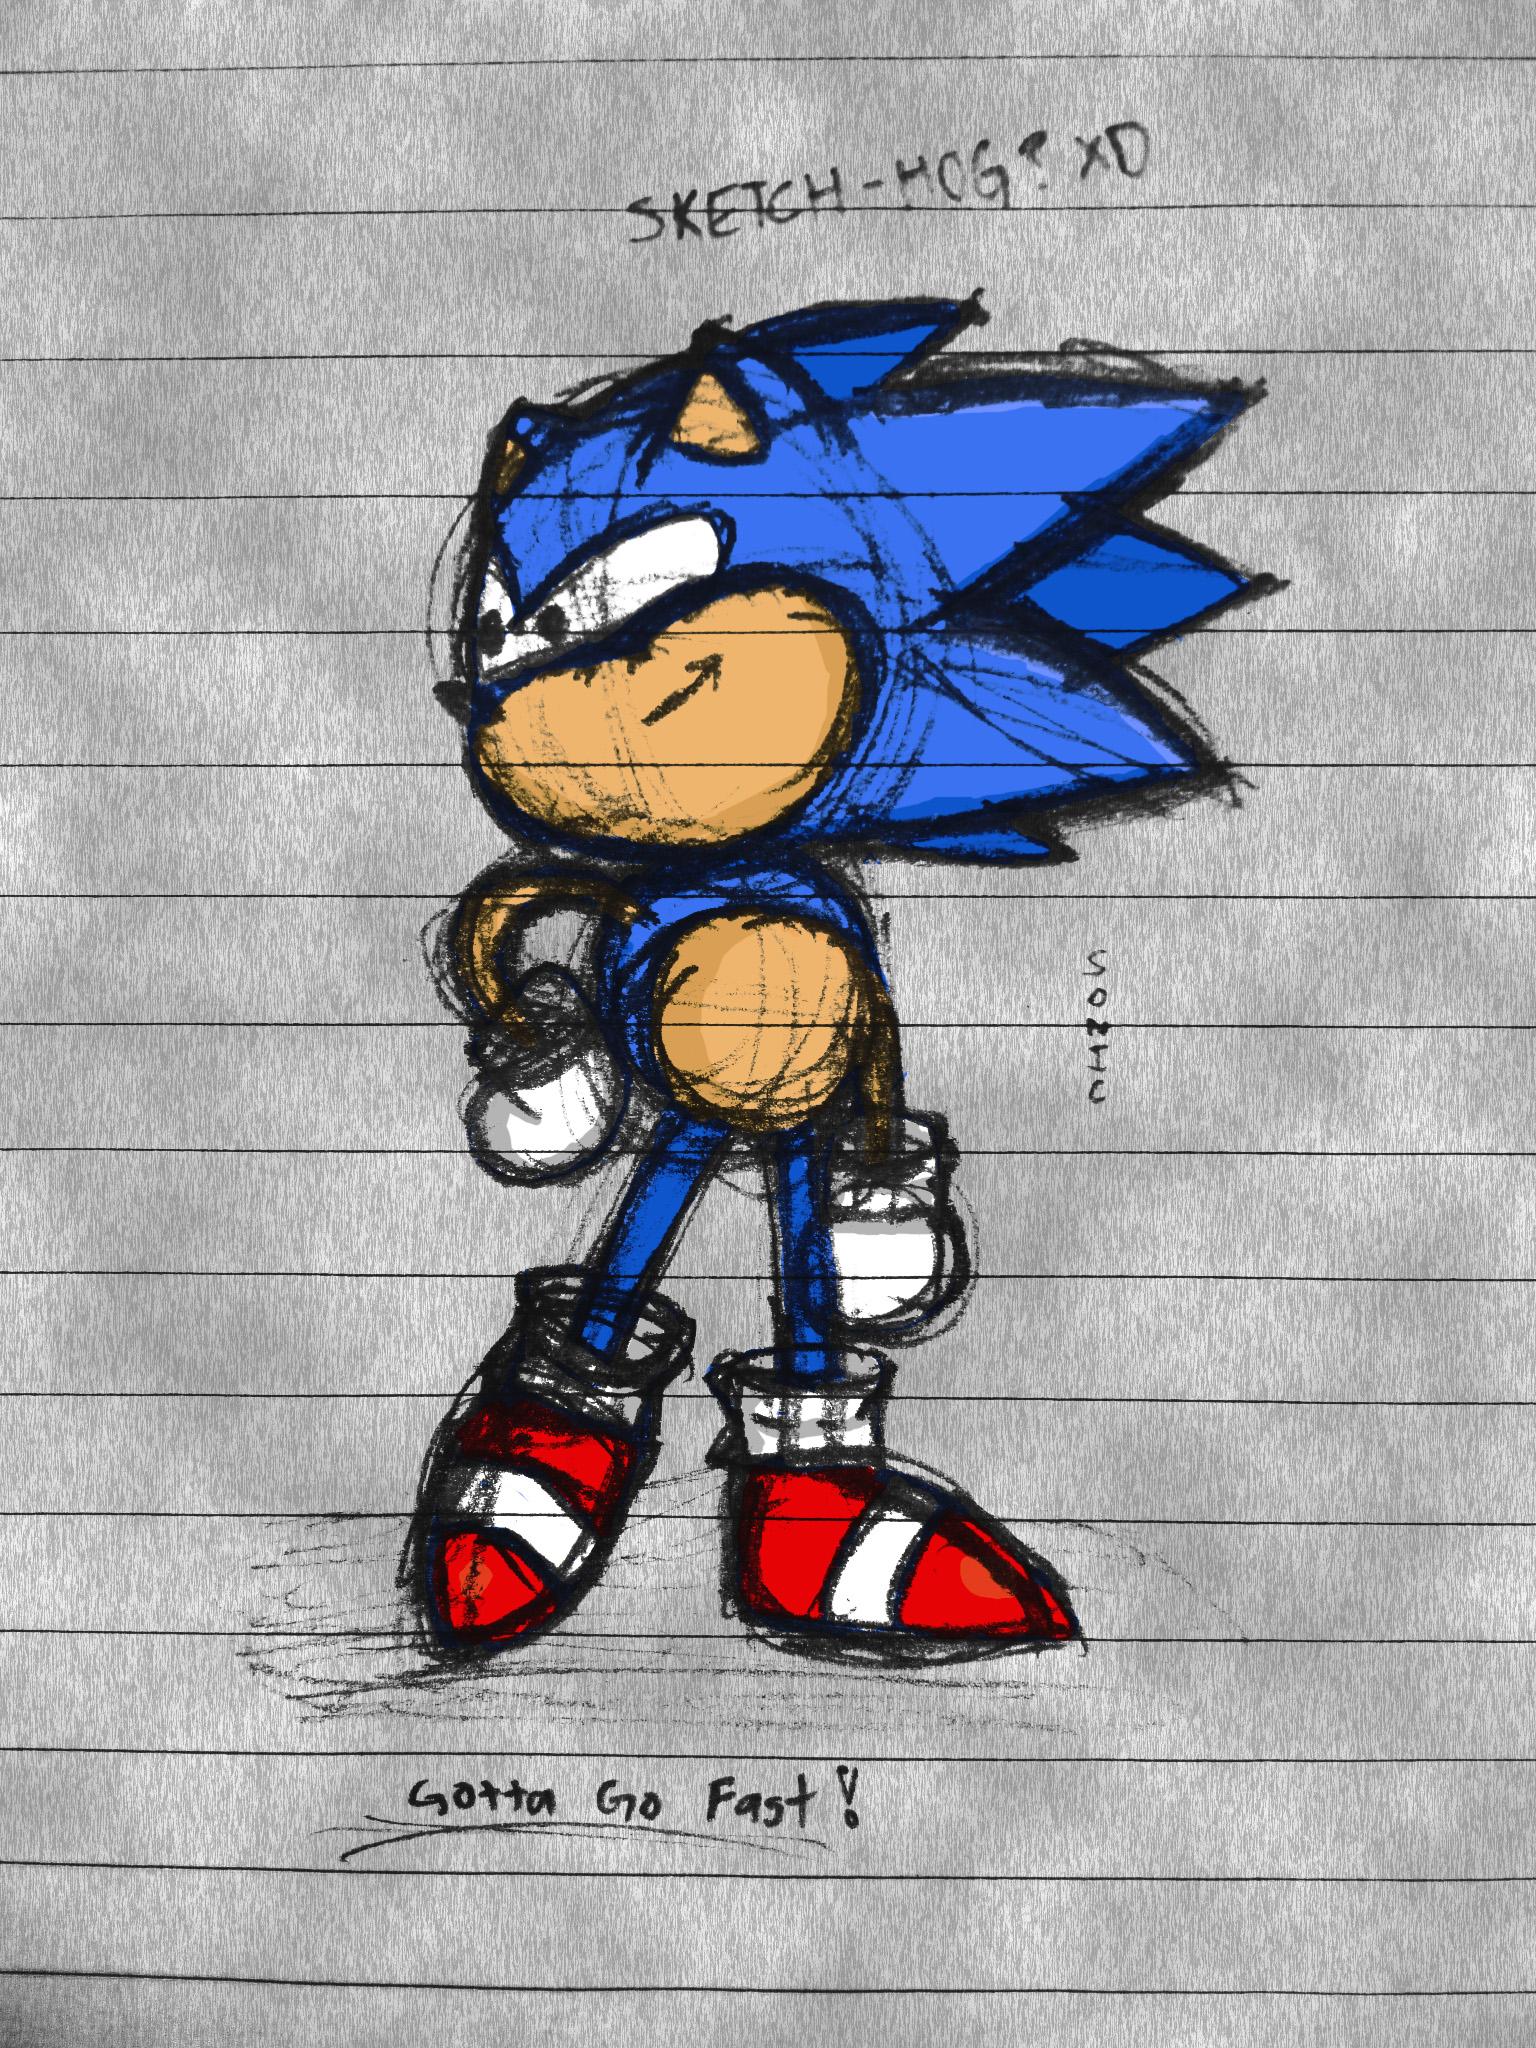 Sketch-hog